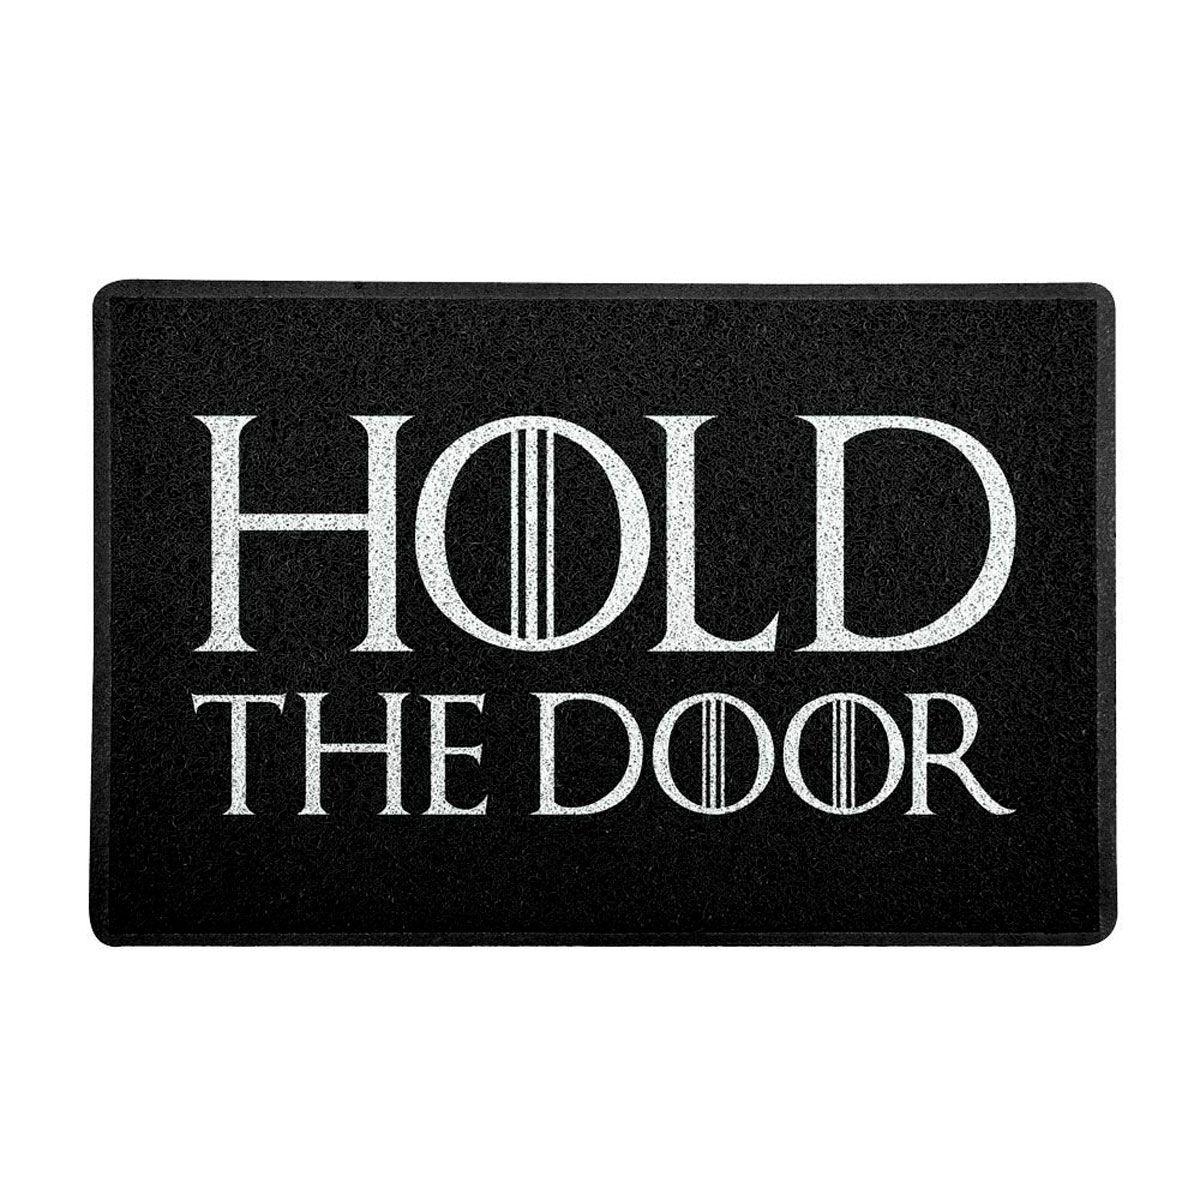 Capacho Decoração Geek 60x40cm Hold the Door - Game Of Thrones